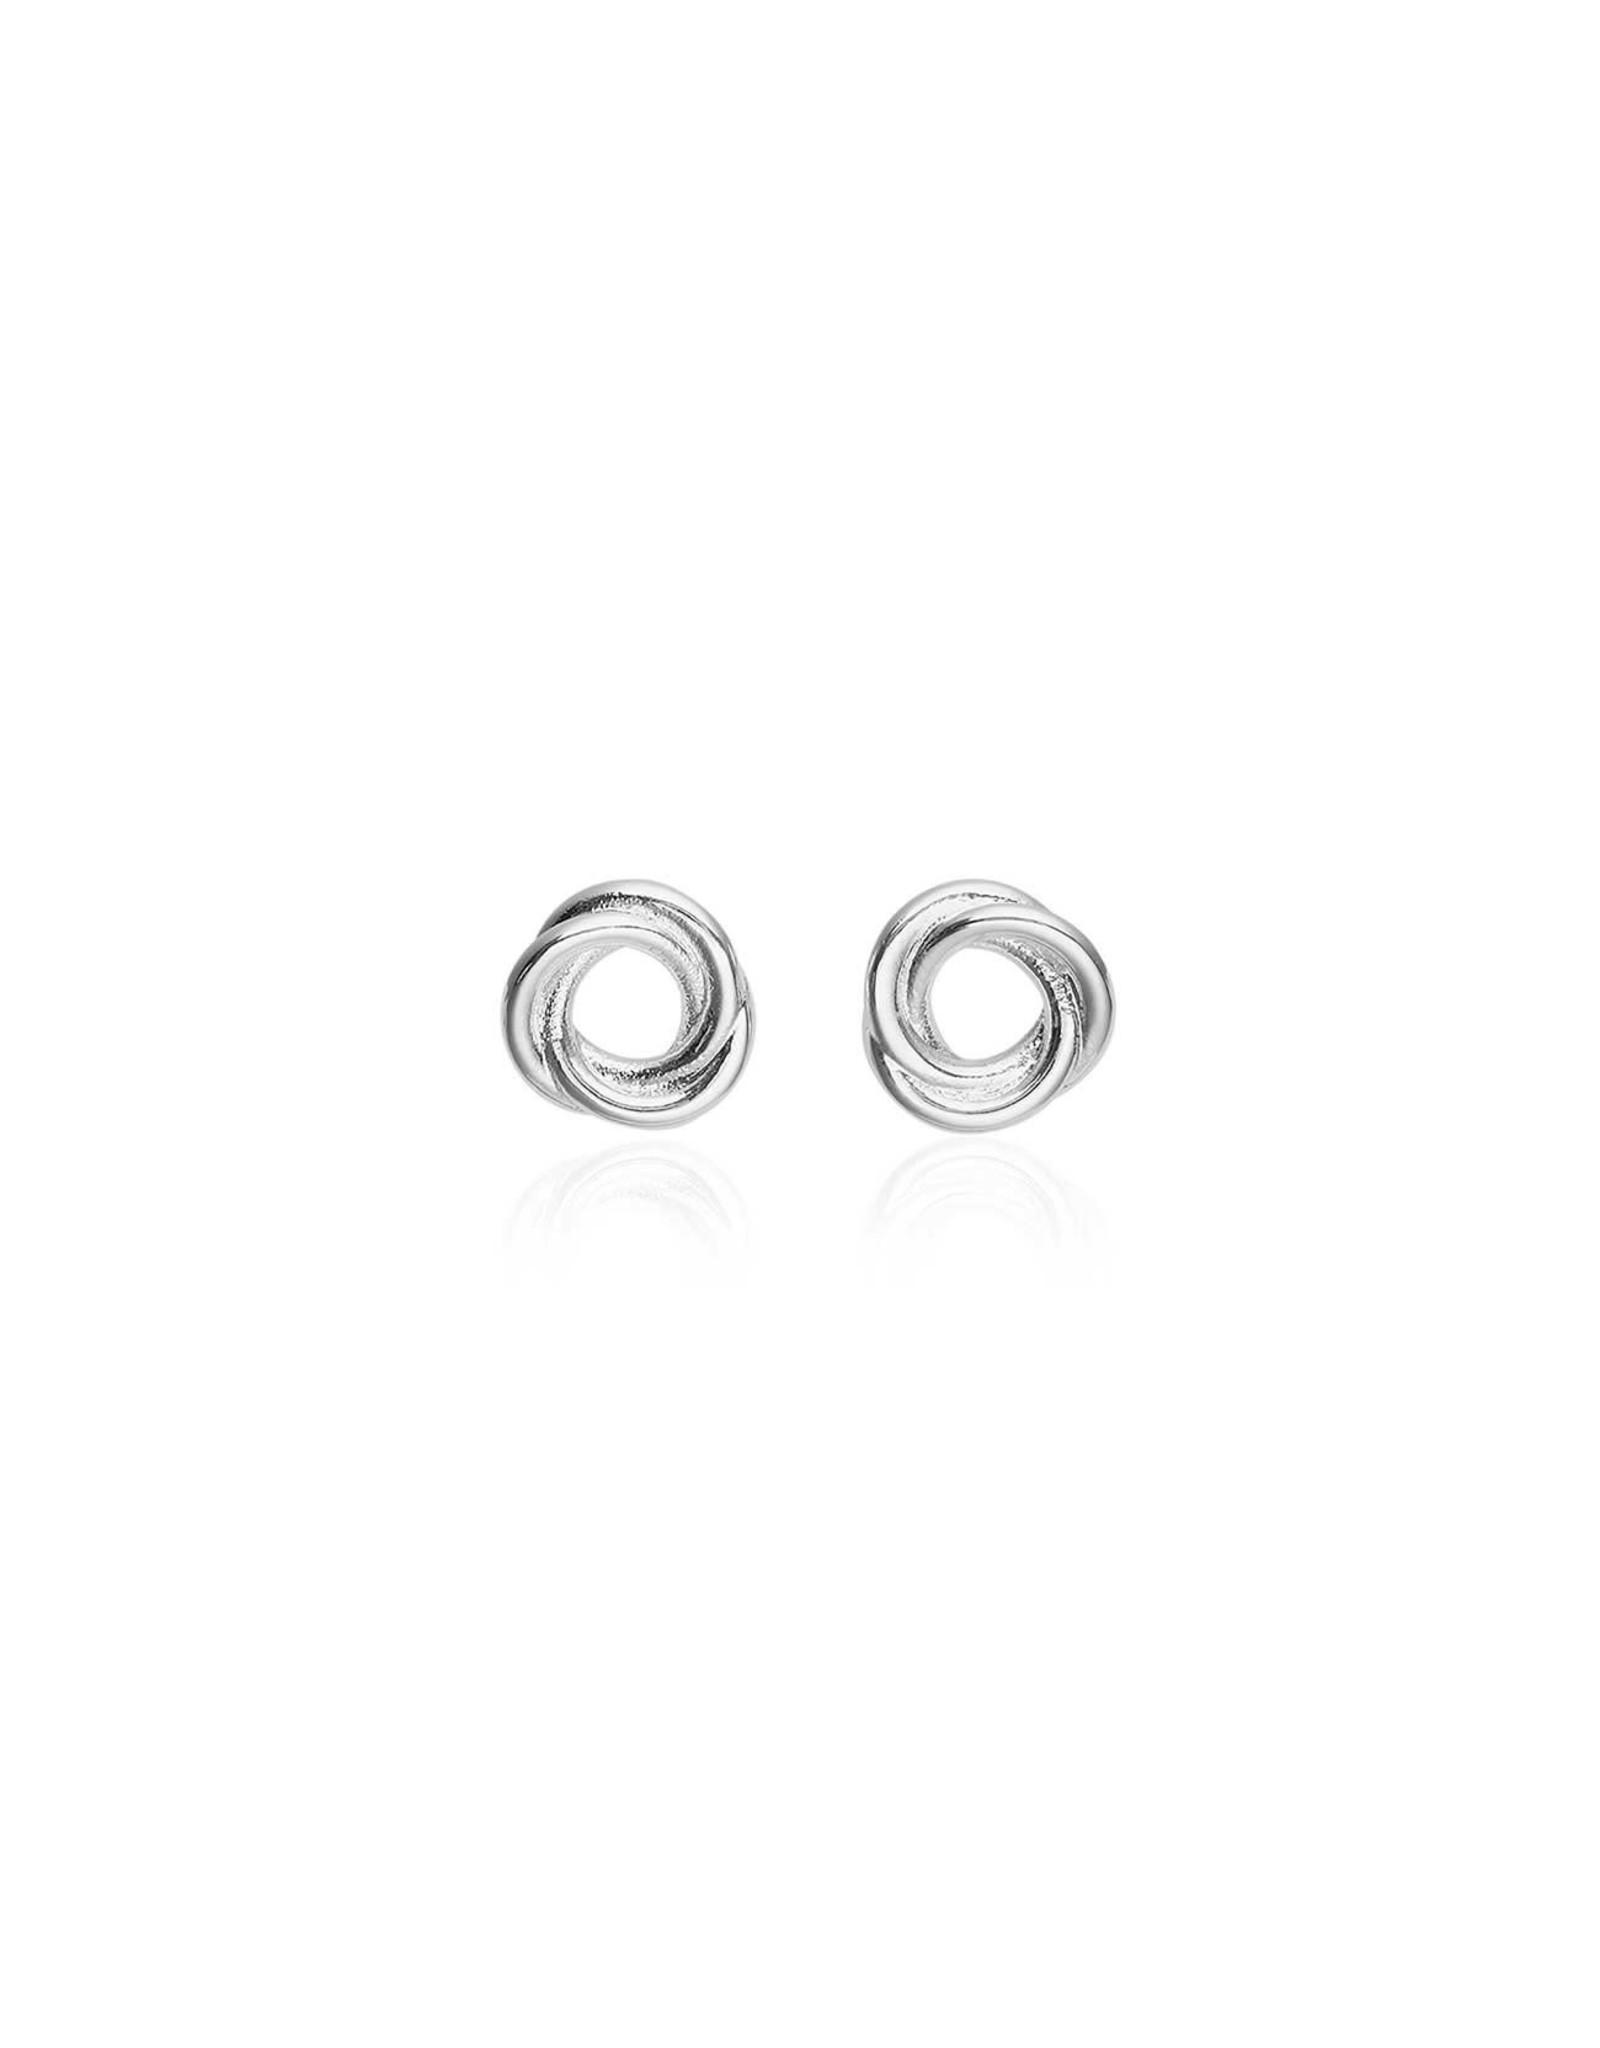 Joma Jewellery Treasure the Little Things Oorbellen - Friendship Knot